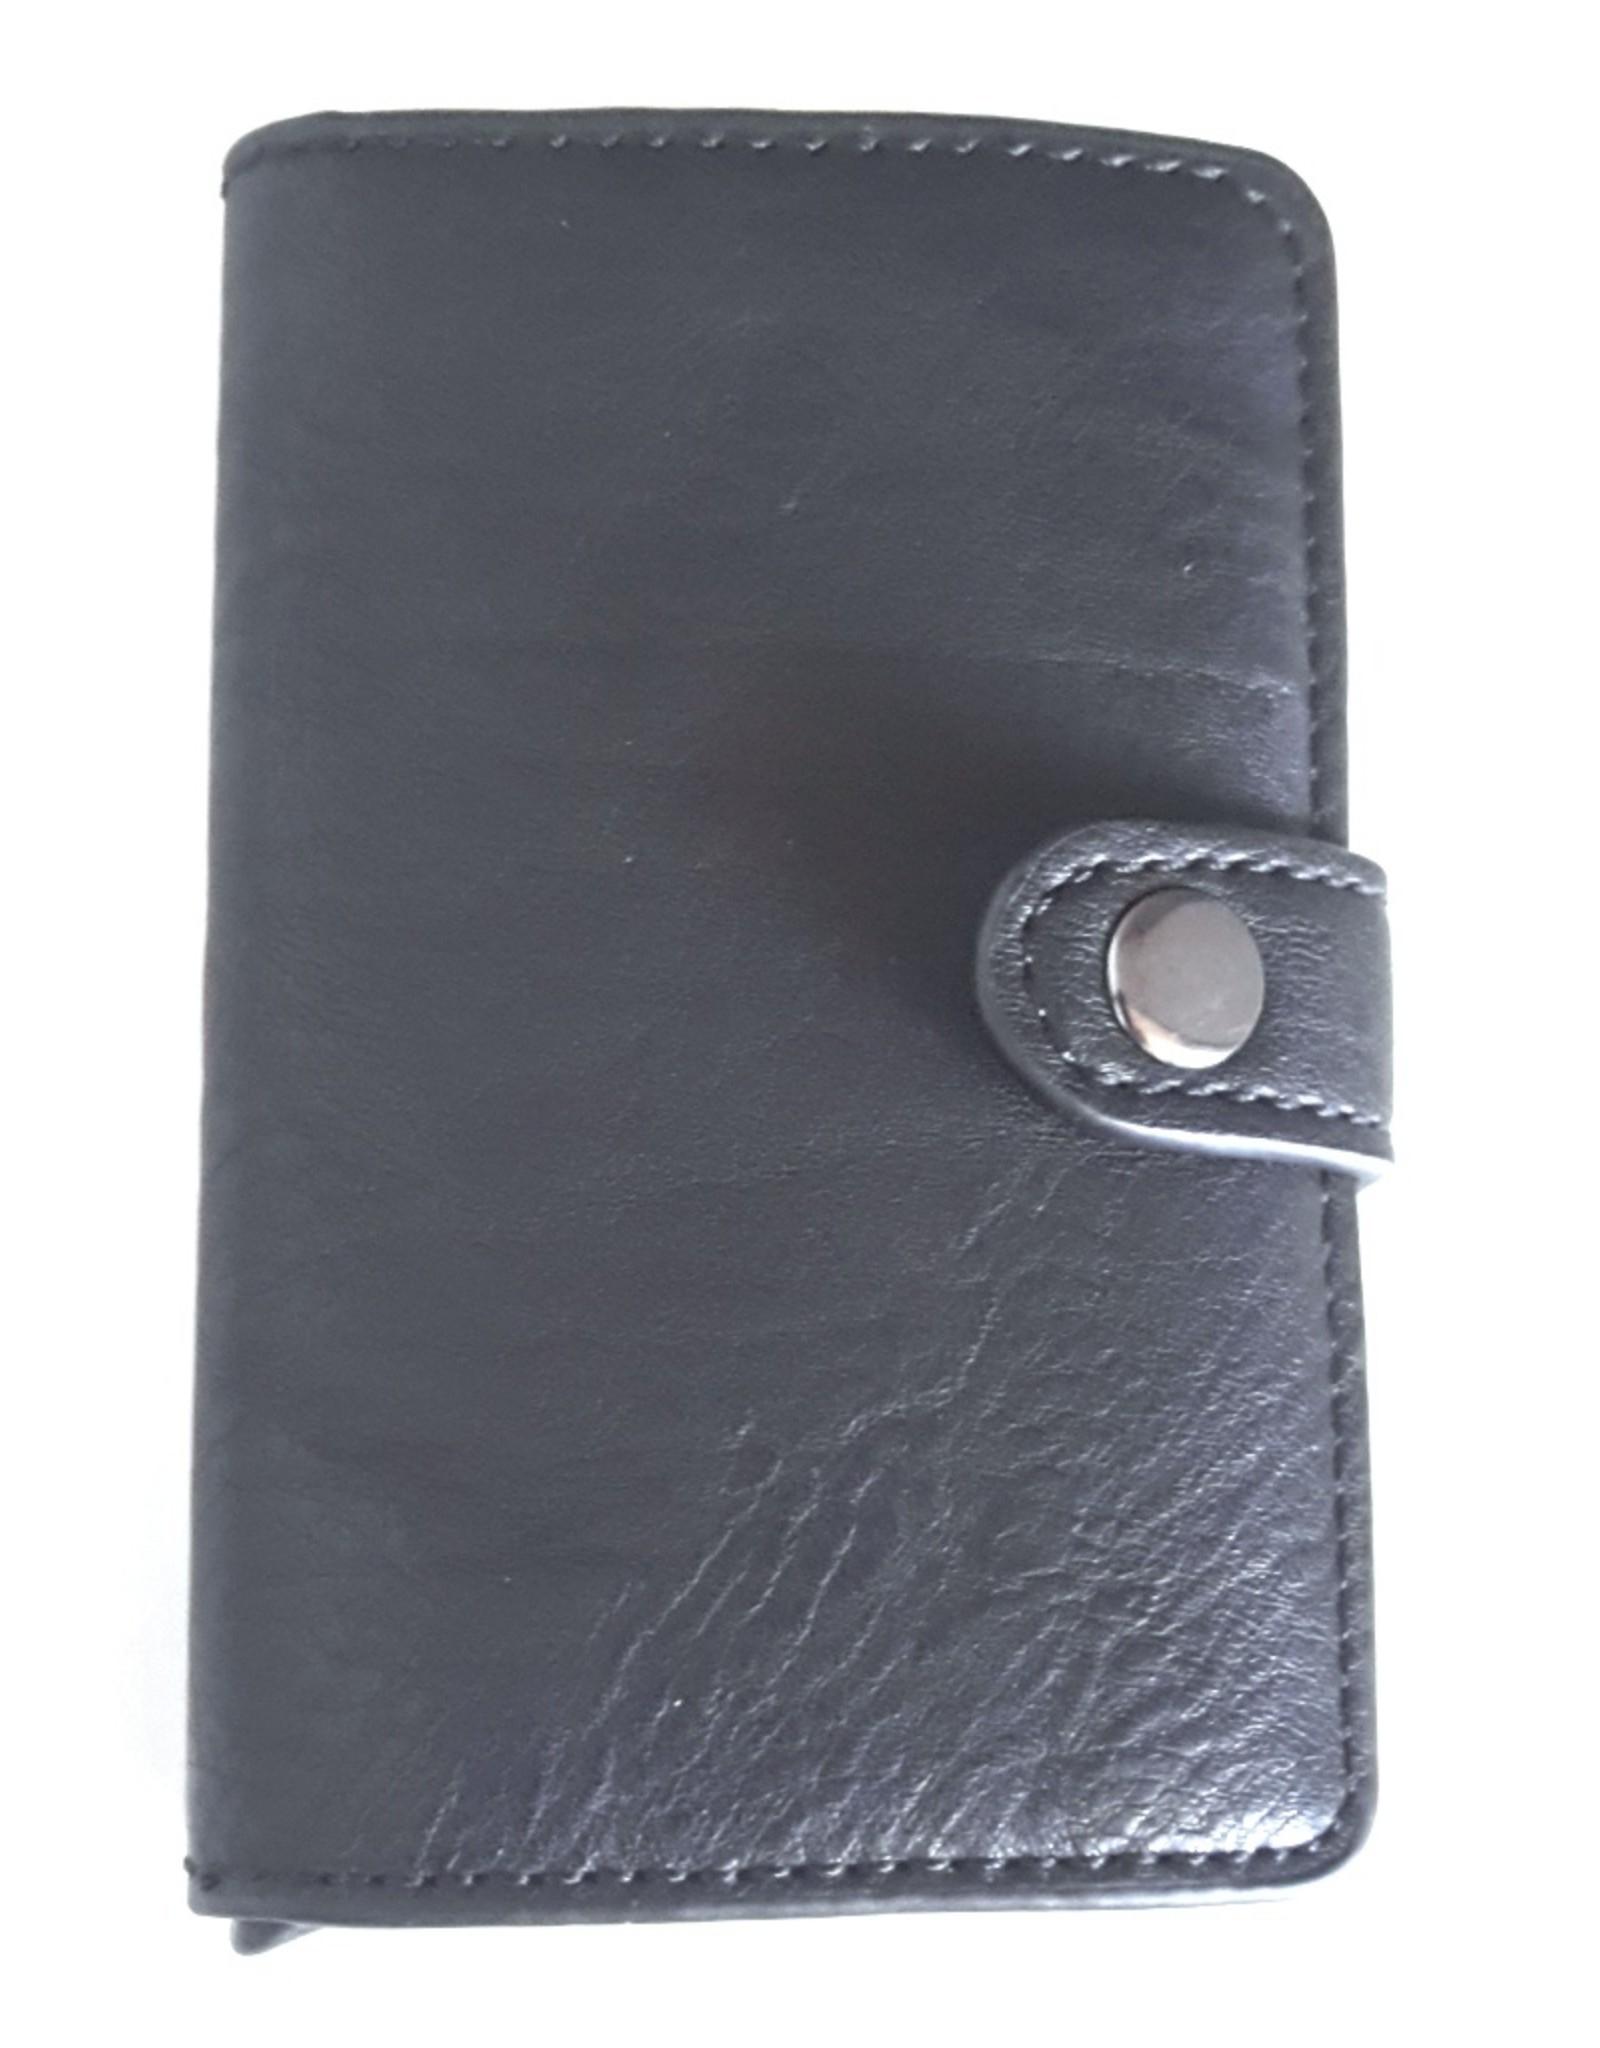 Avond tassen, Clutches en Portemonnees - Miniwallet met aluminium card protector (zwart)